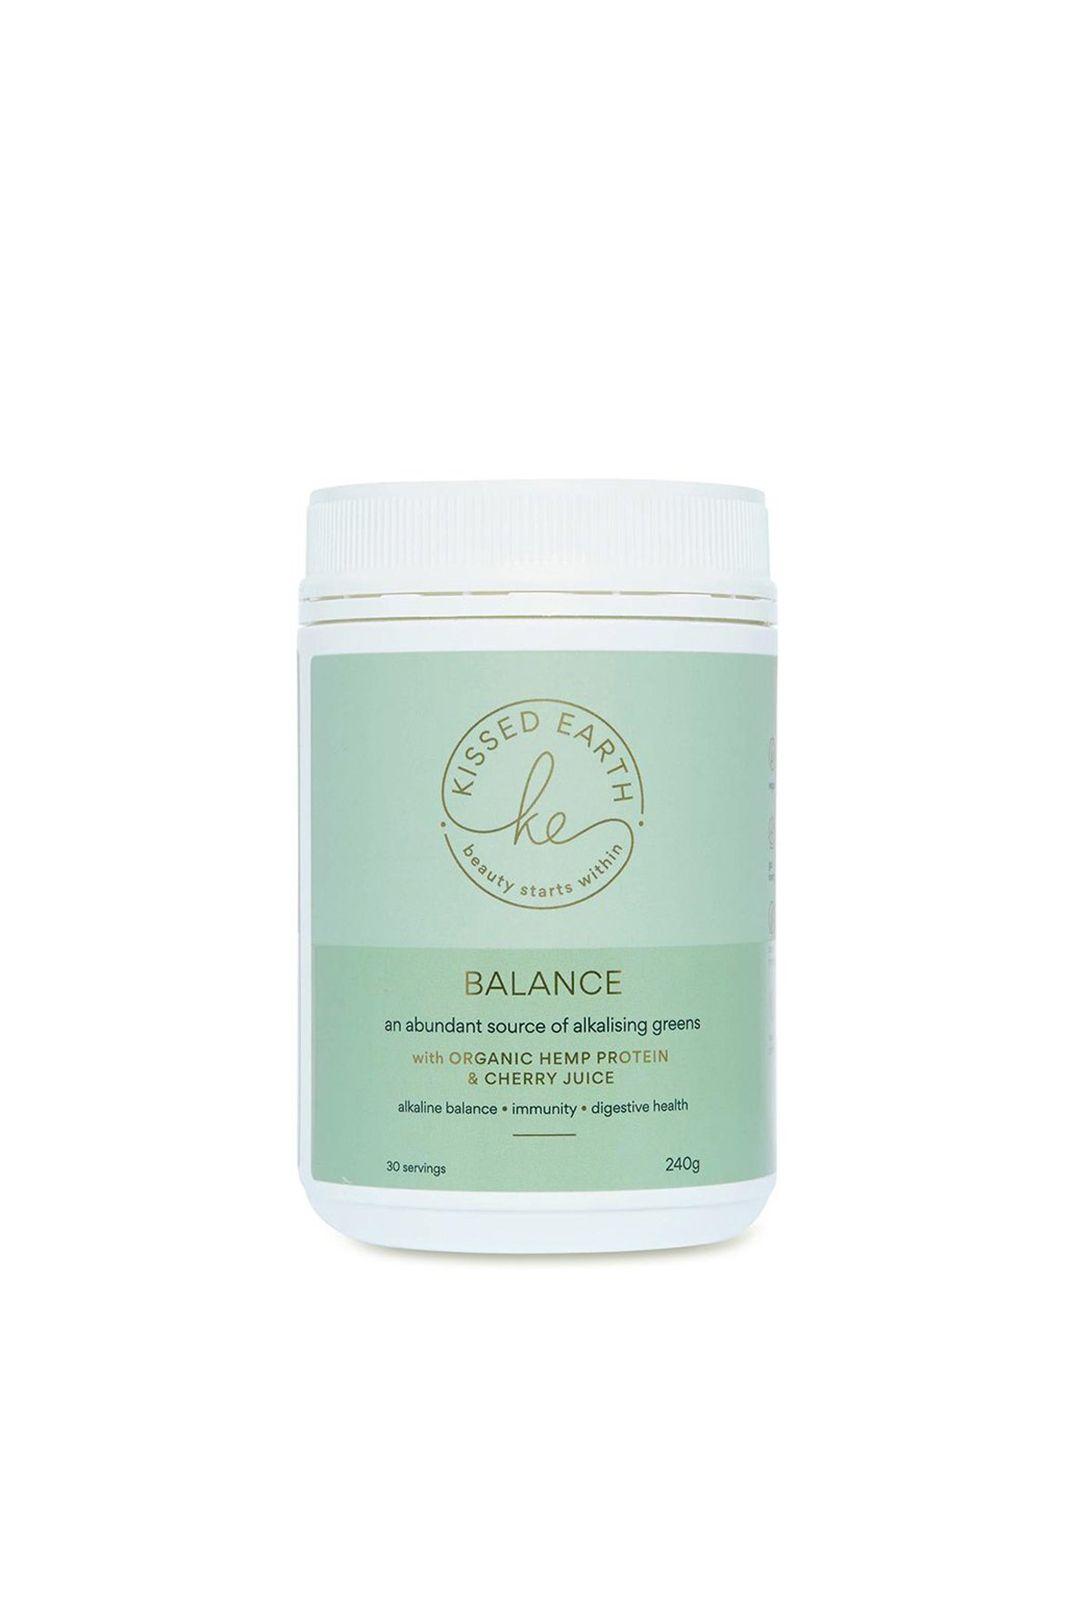 kissed-earth-balance-organic-hemp-protein-cherry-juice-alkalising-supplement-front